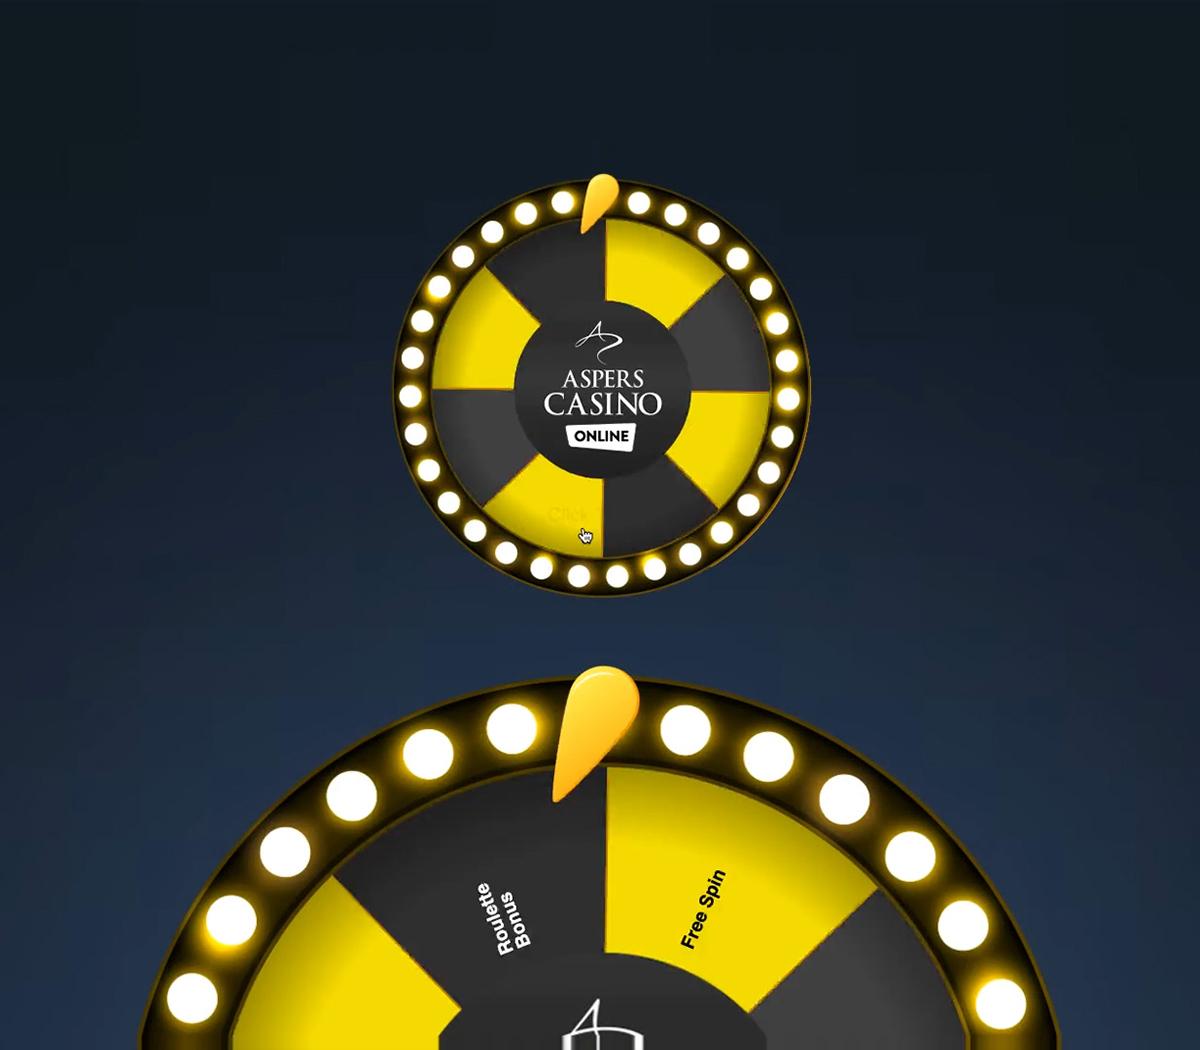 Aspers Casino Online